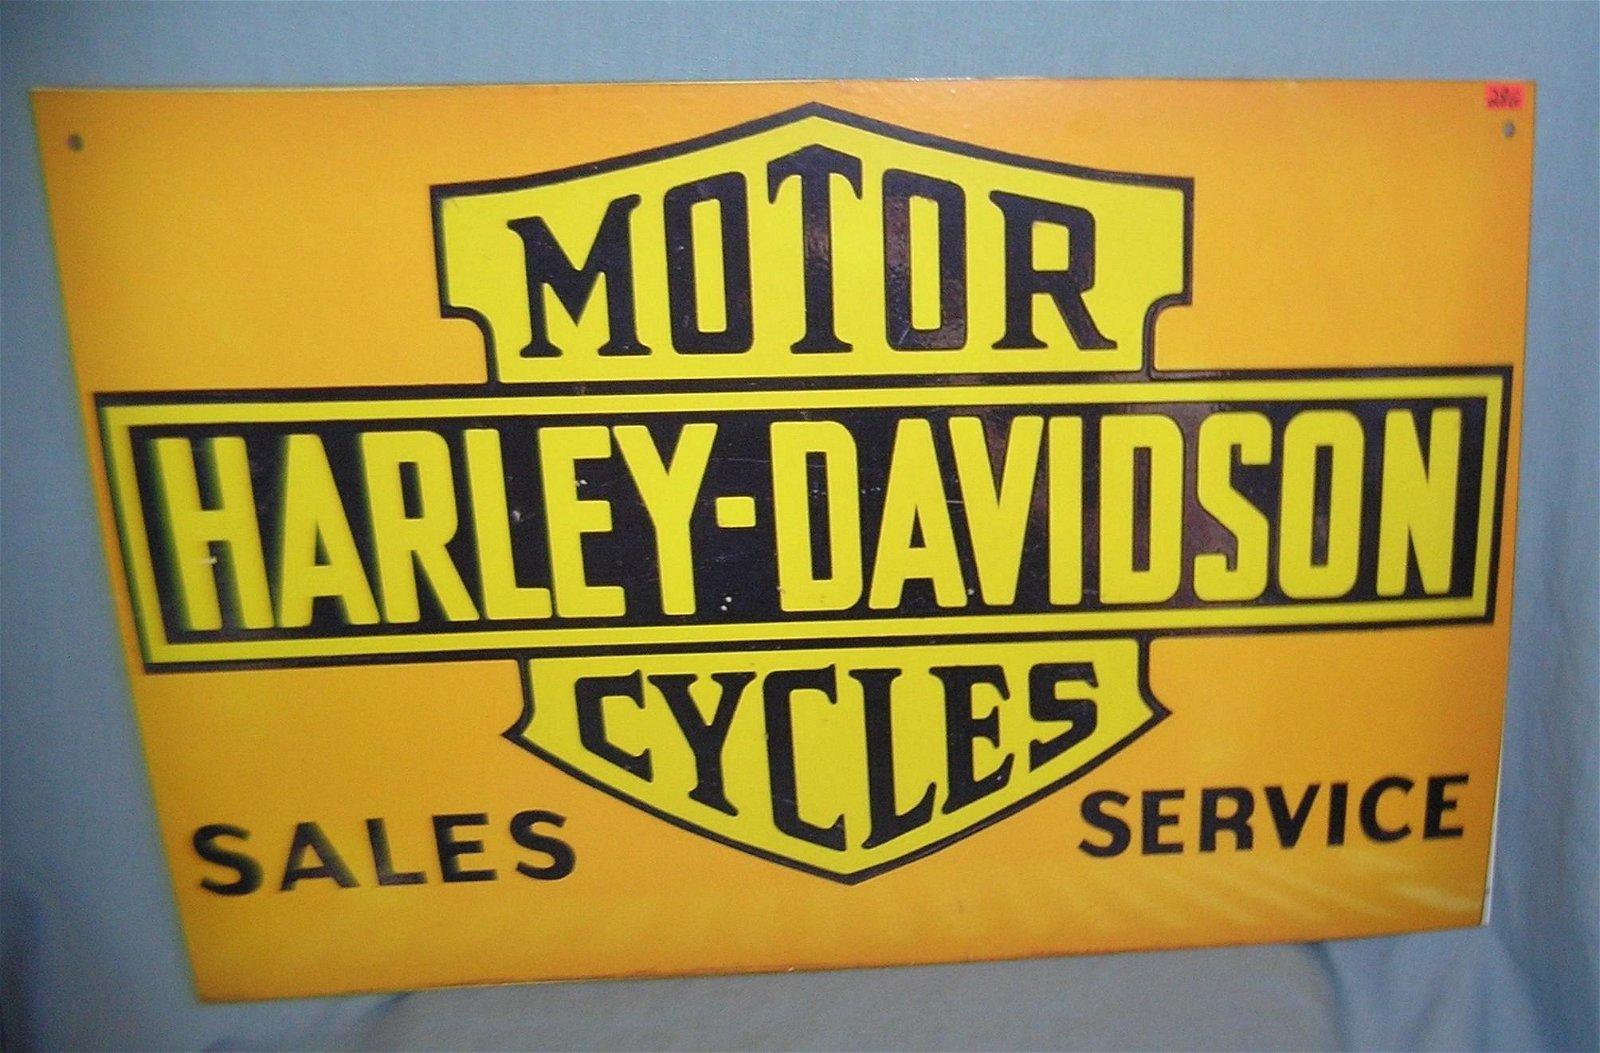 Antique style retro Harley Davidson advertising sign